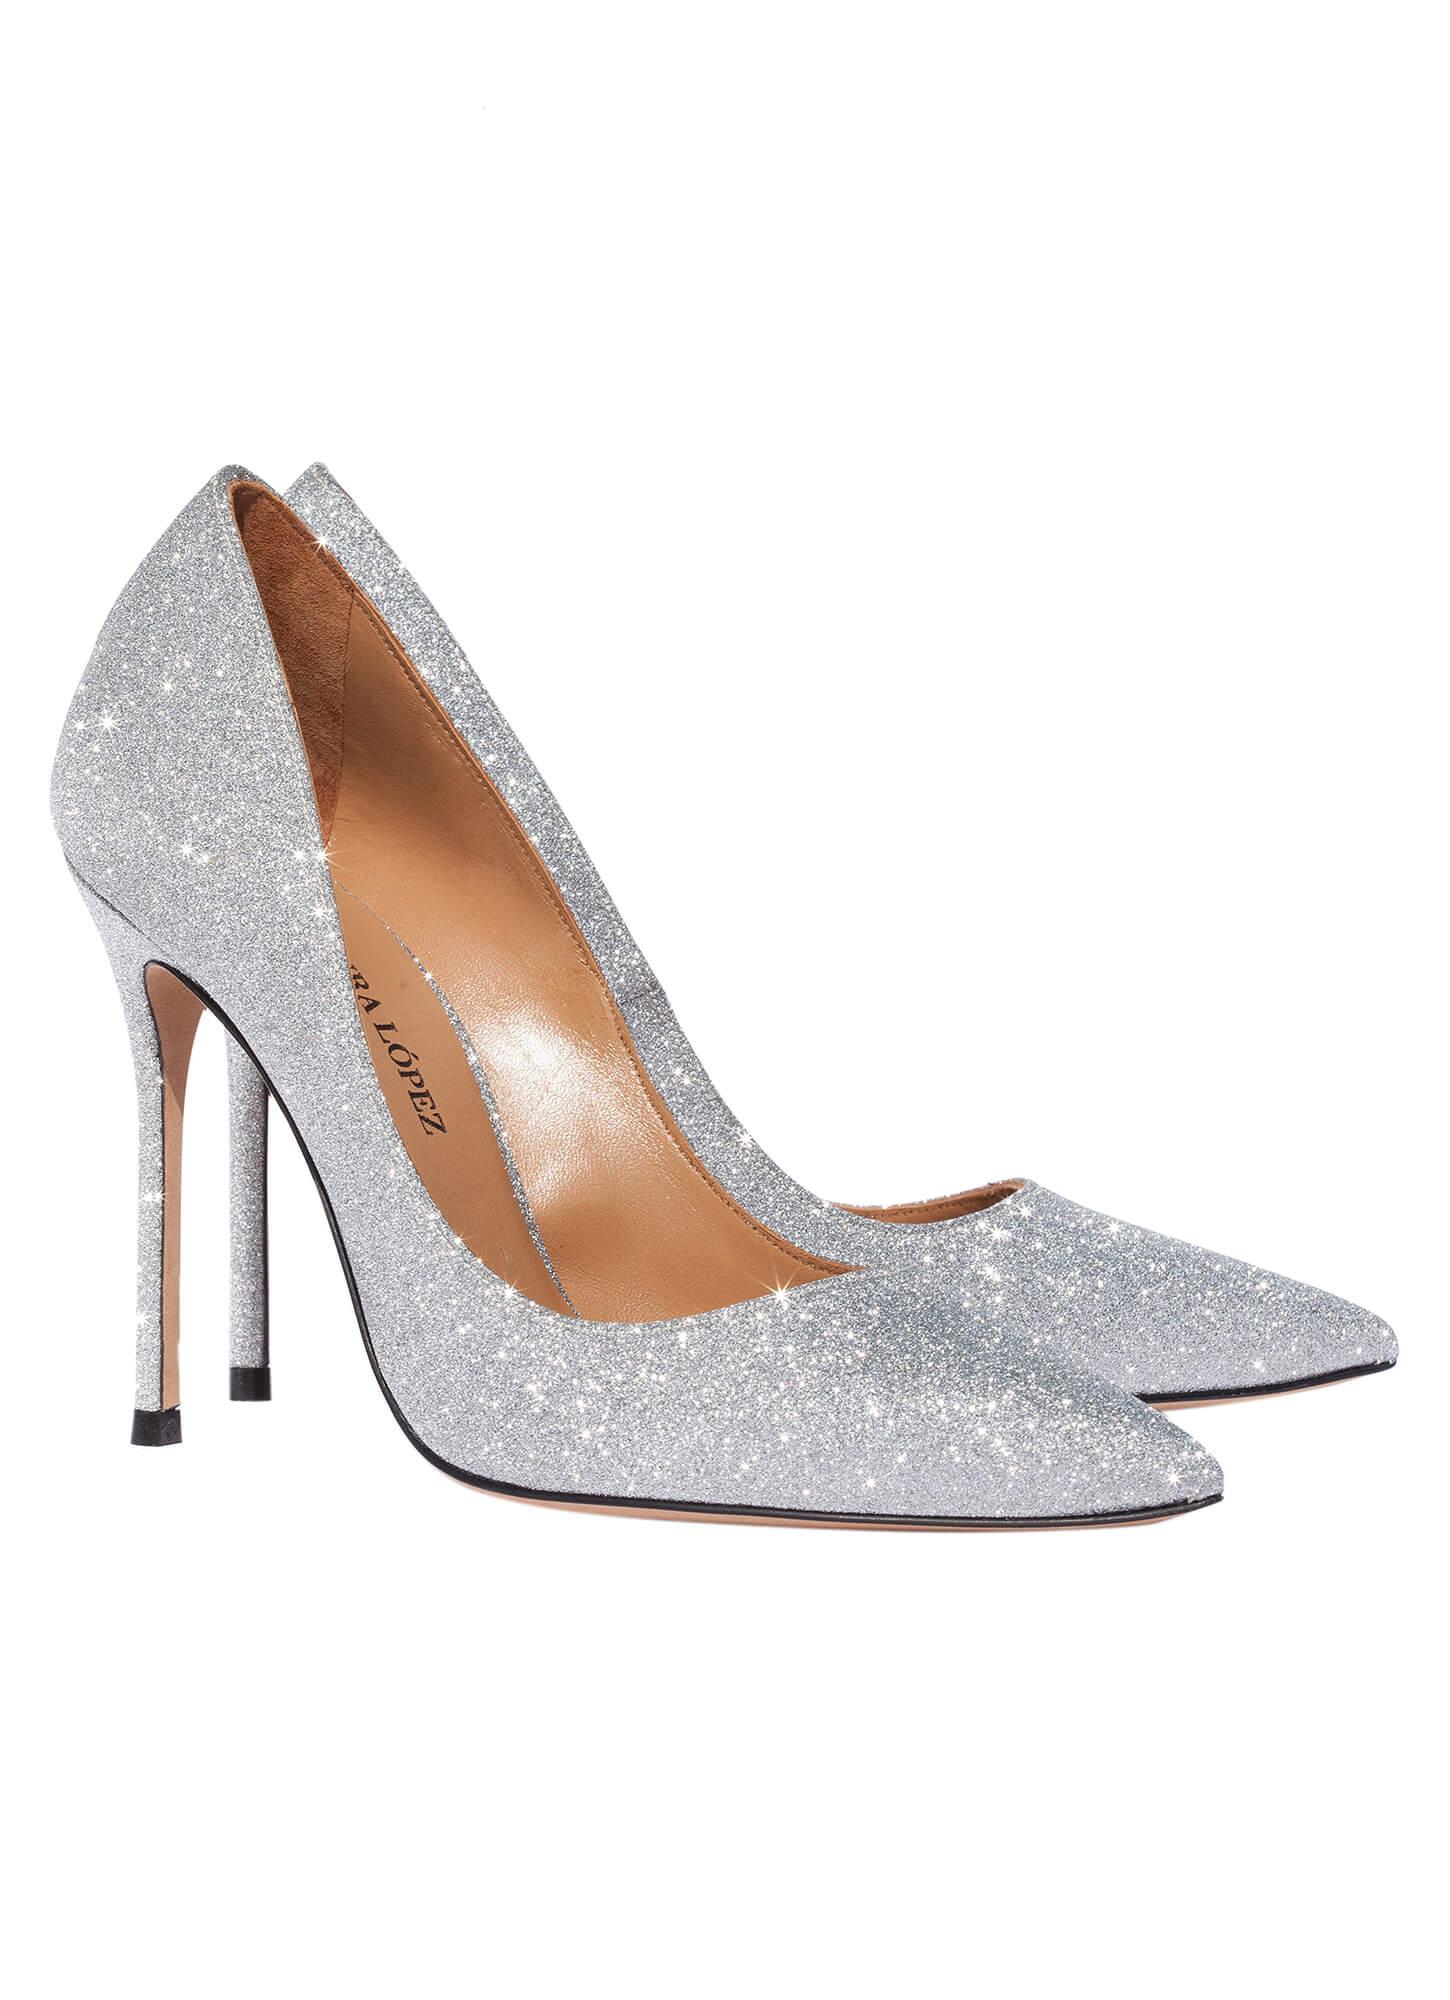 high heel pumps in silver glitter online shoe store pura. Black Bedroom Furniture Sets. Home Design Ideas